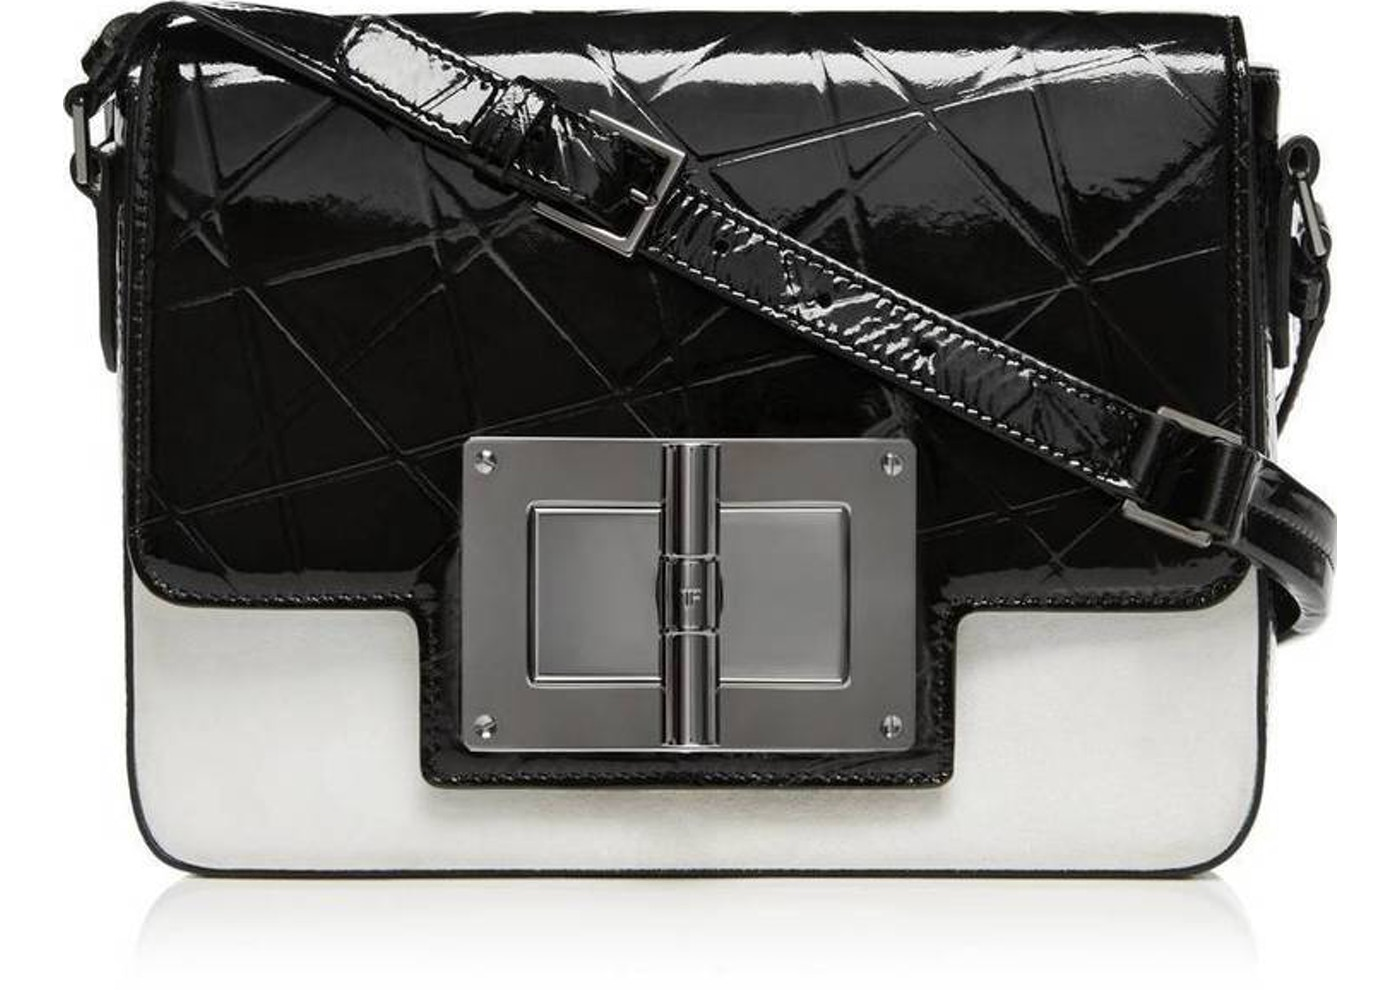 dedf8bf6e2c3b Tom Ford Natalia Day Bag Crossbody Medium Black/White. Medium Black/White